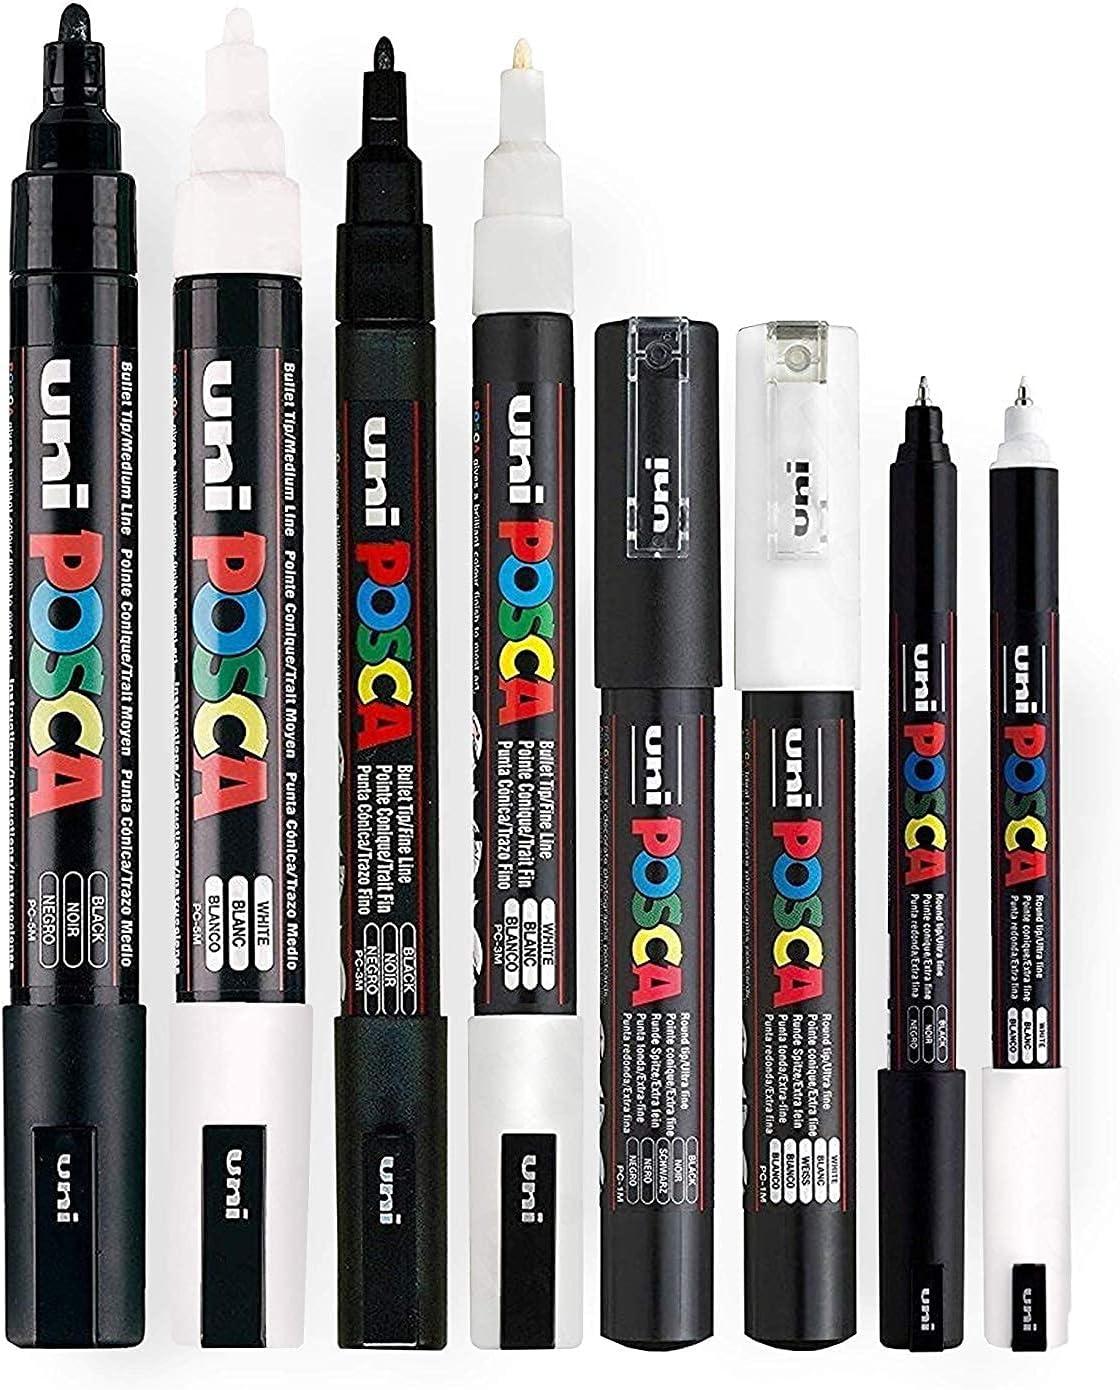 POSCA Noir &blanc fin à moyen (Lot de 8 stylos (PC- 5 m, PC- PC- 3 m, 1 m du PC - 1MR)